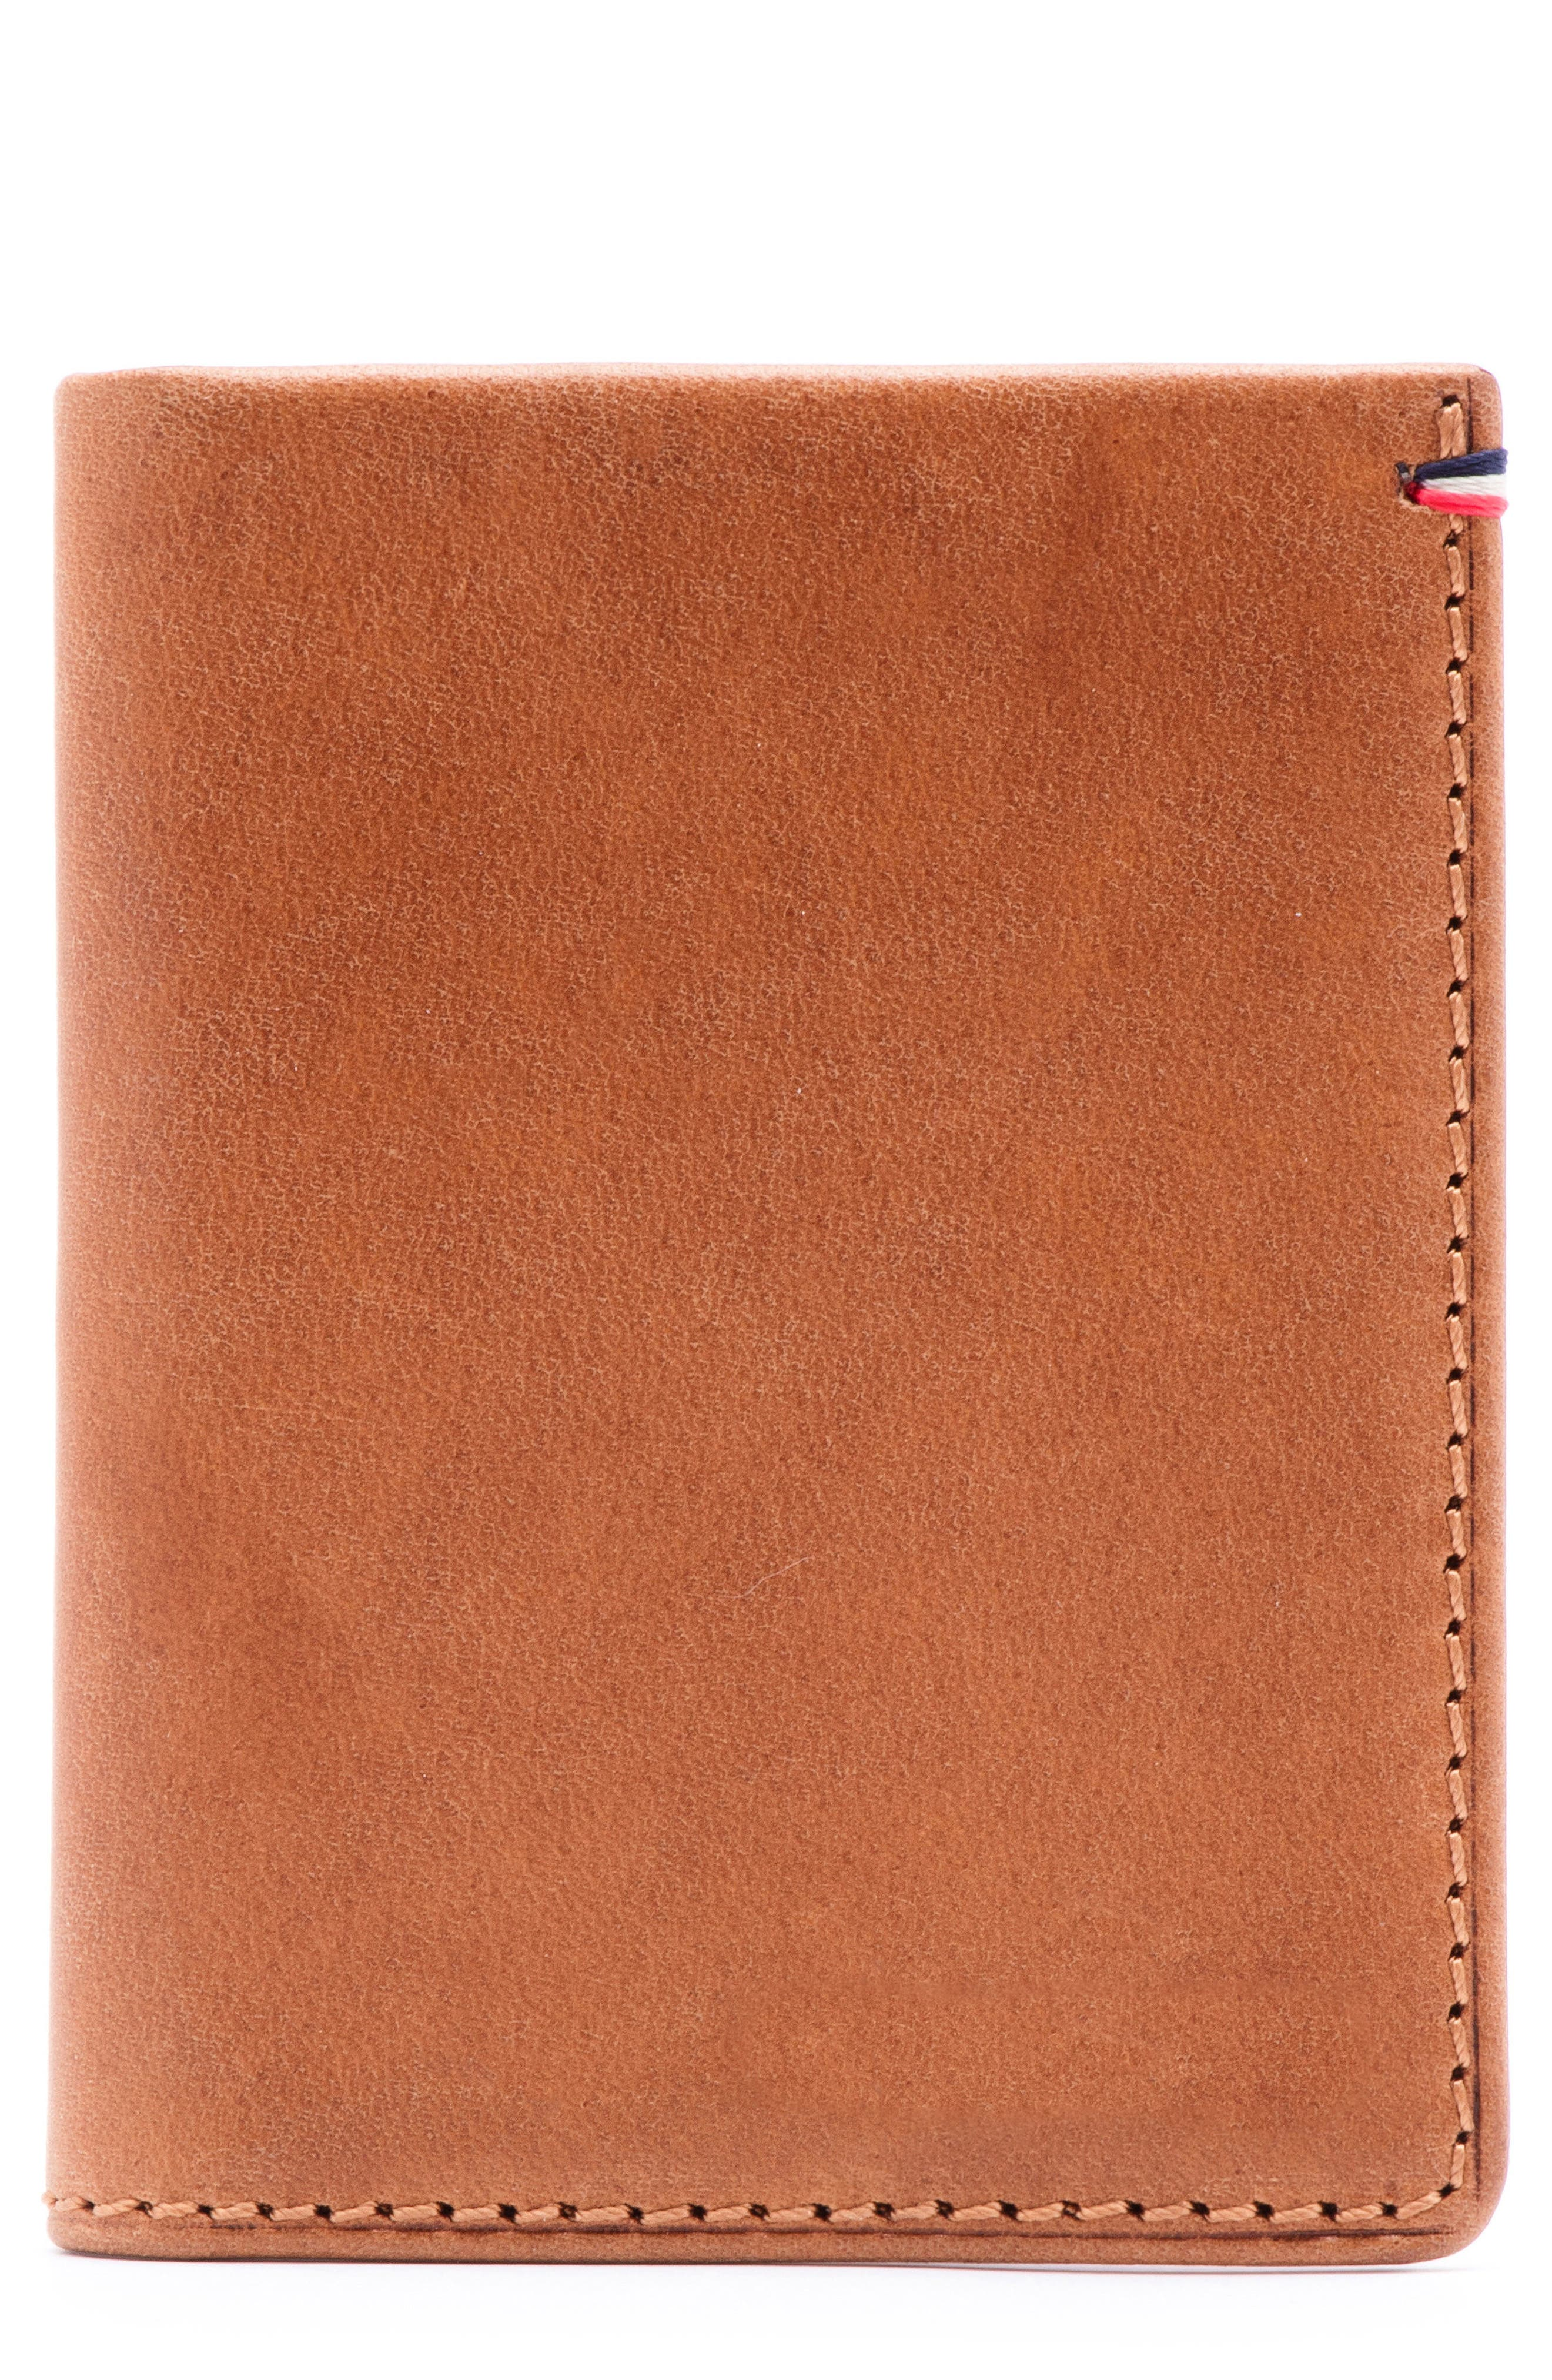 Core Leather Wallet,                         Main,                         color, Tan